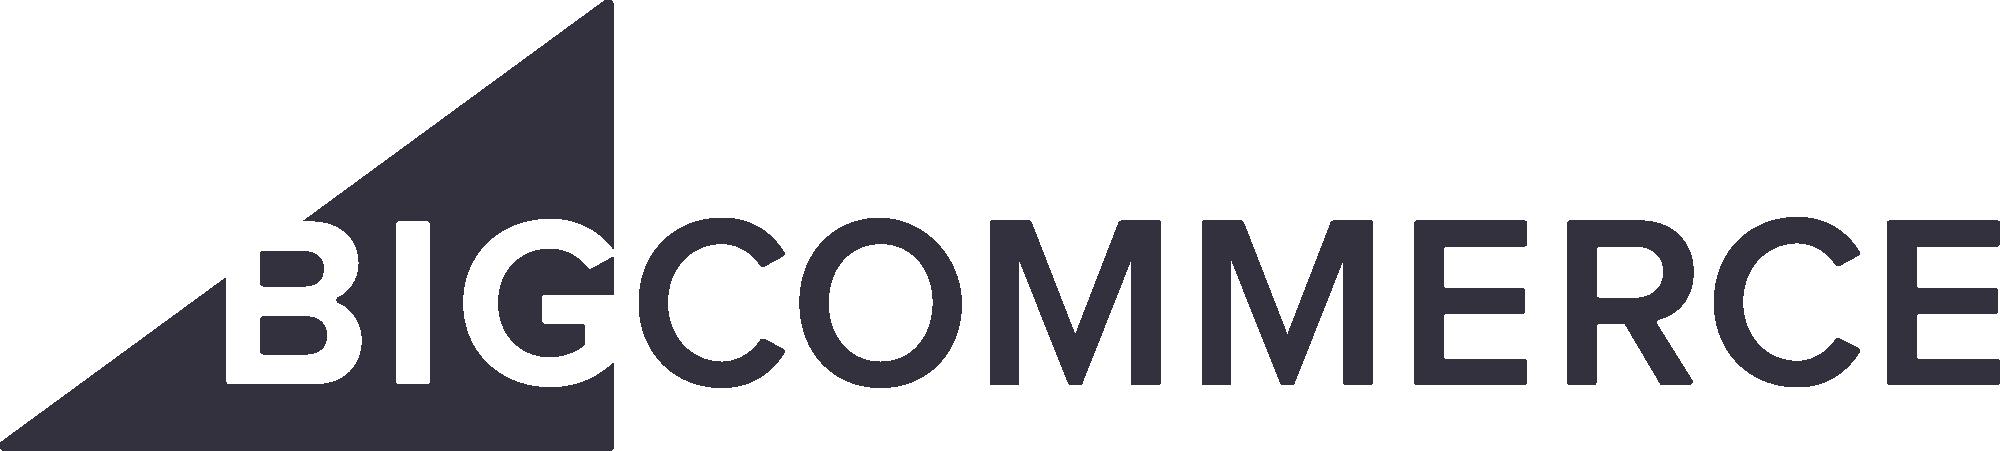 Bigcommerce logo 6a55fab24343a021814755458421064a3ad4e76aebe274c04f8f636863c63a3d